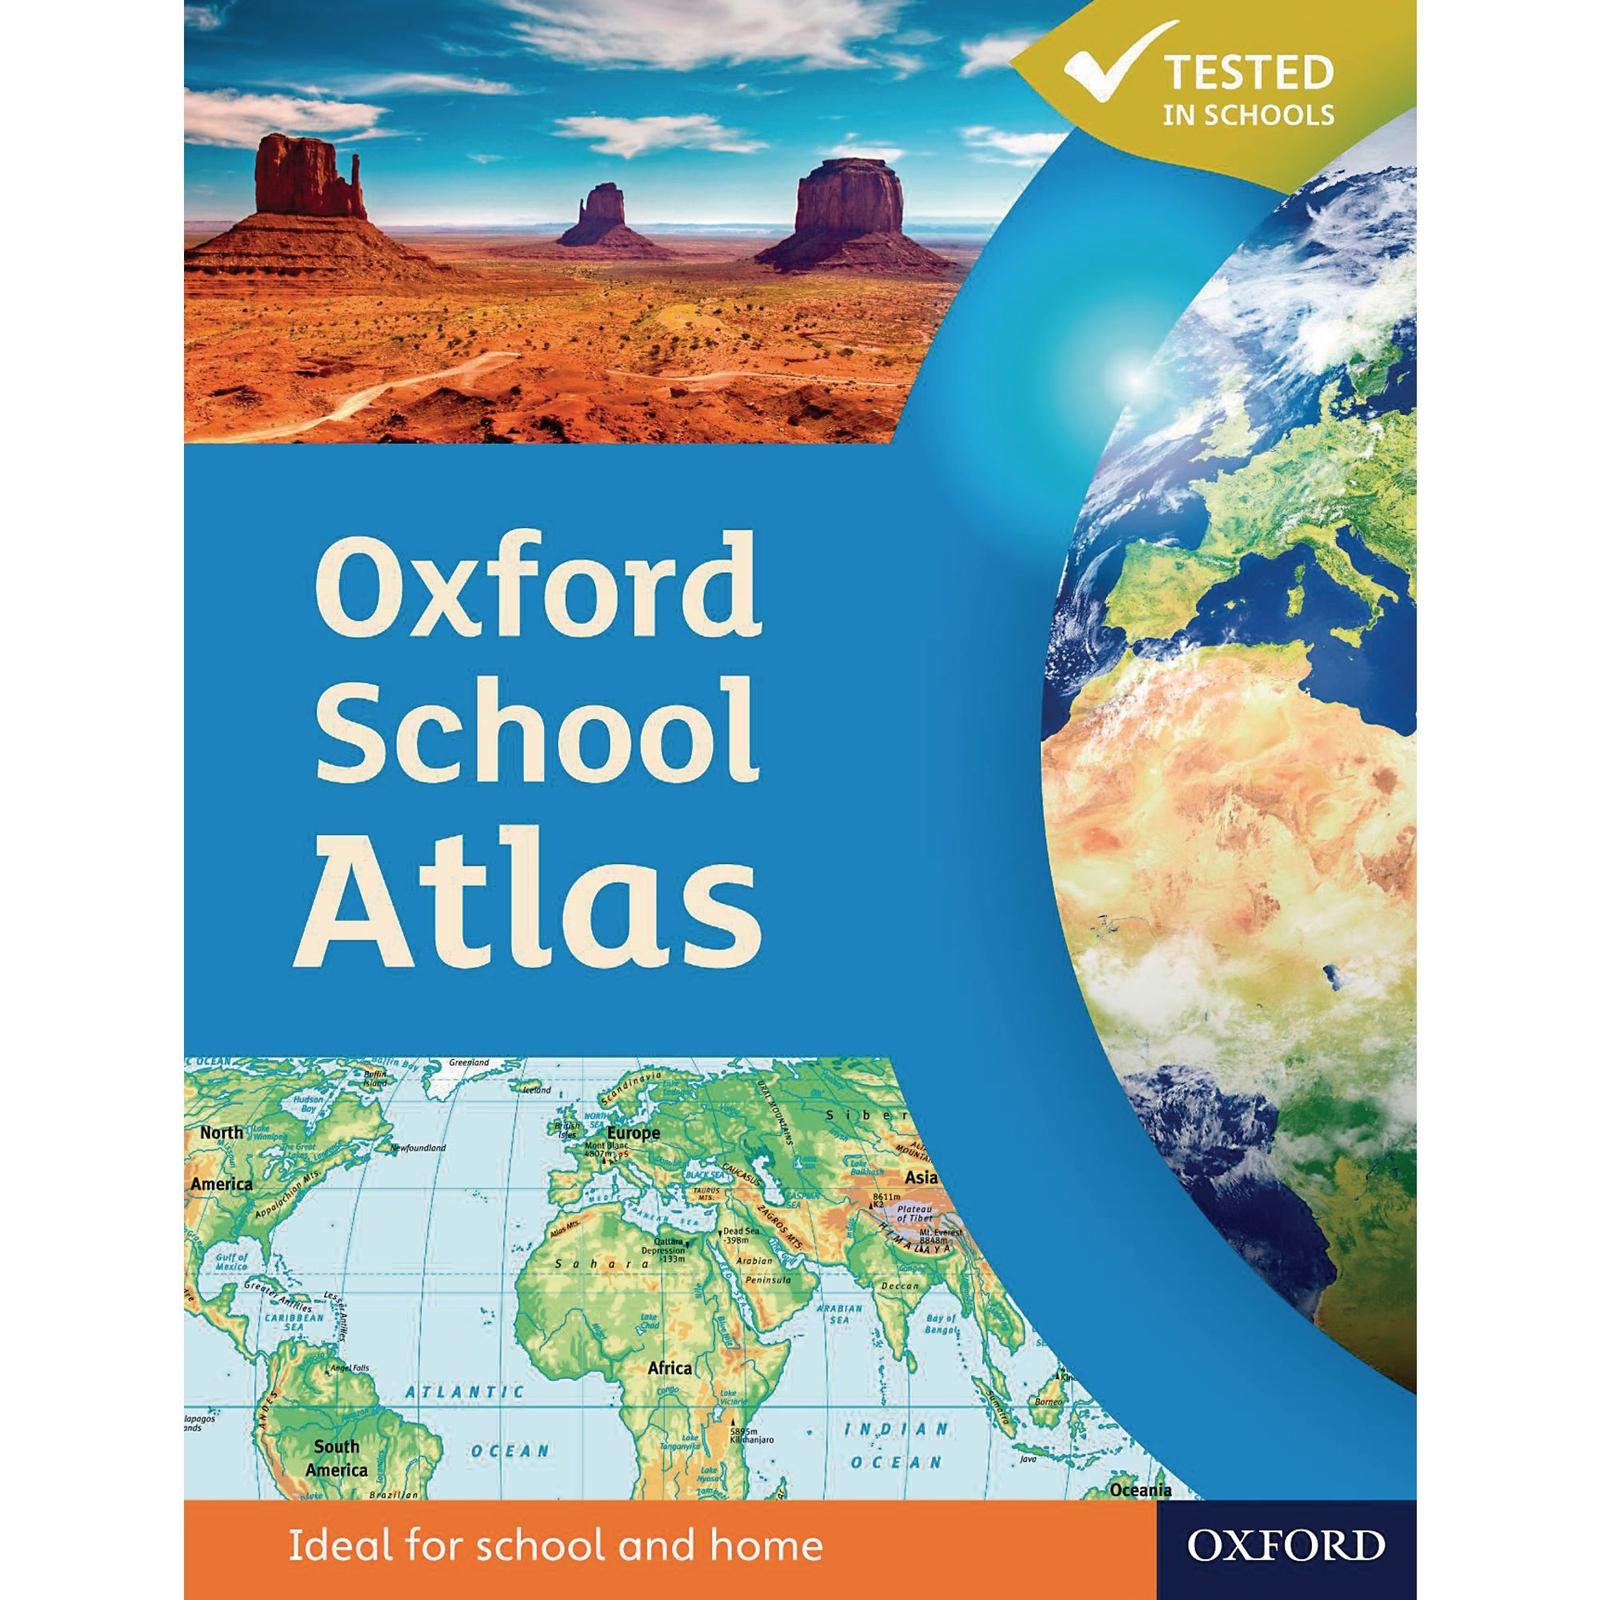 Oxford School Atlas